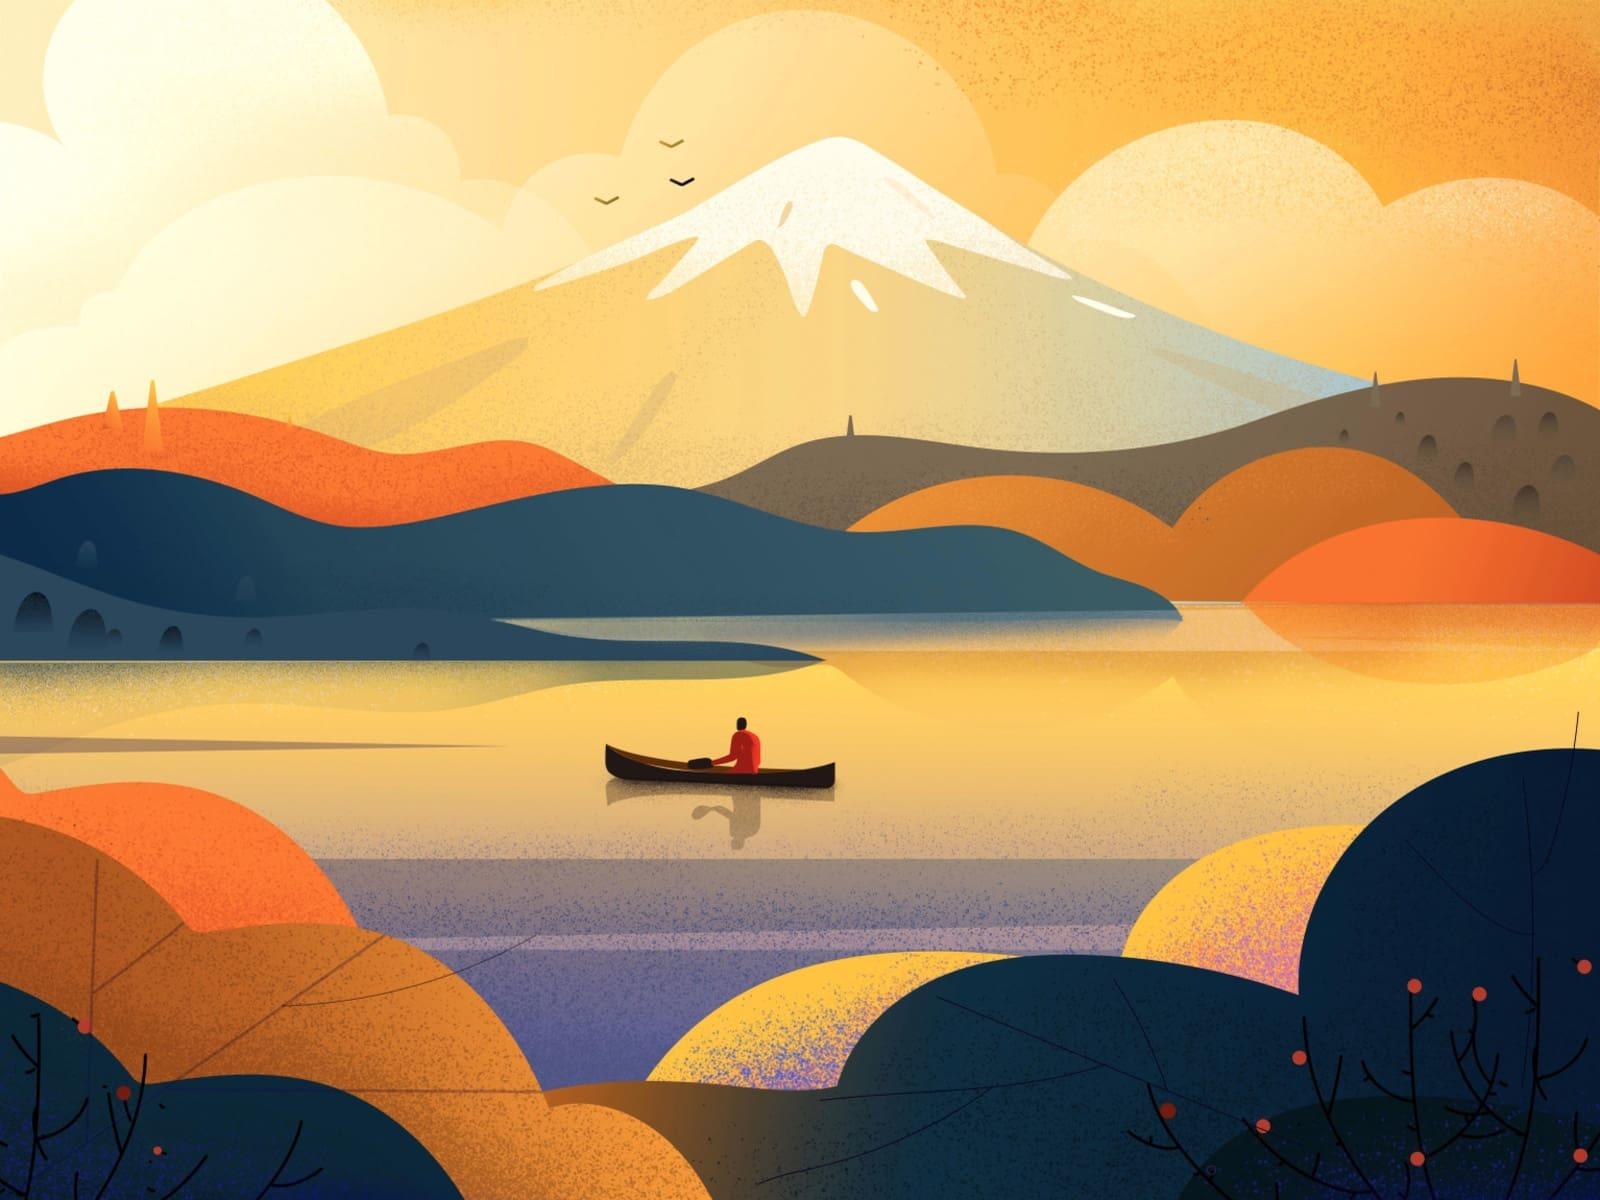 Mount Fuji Boat